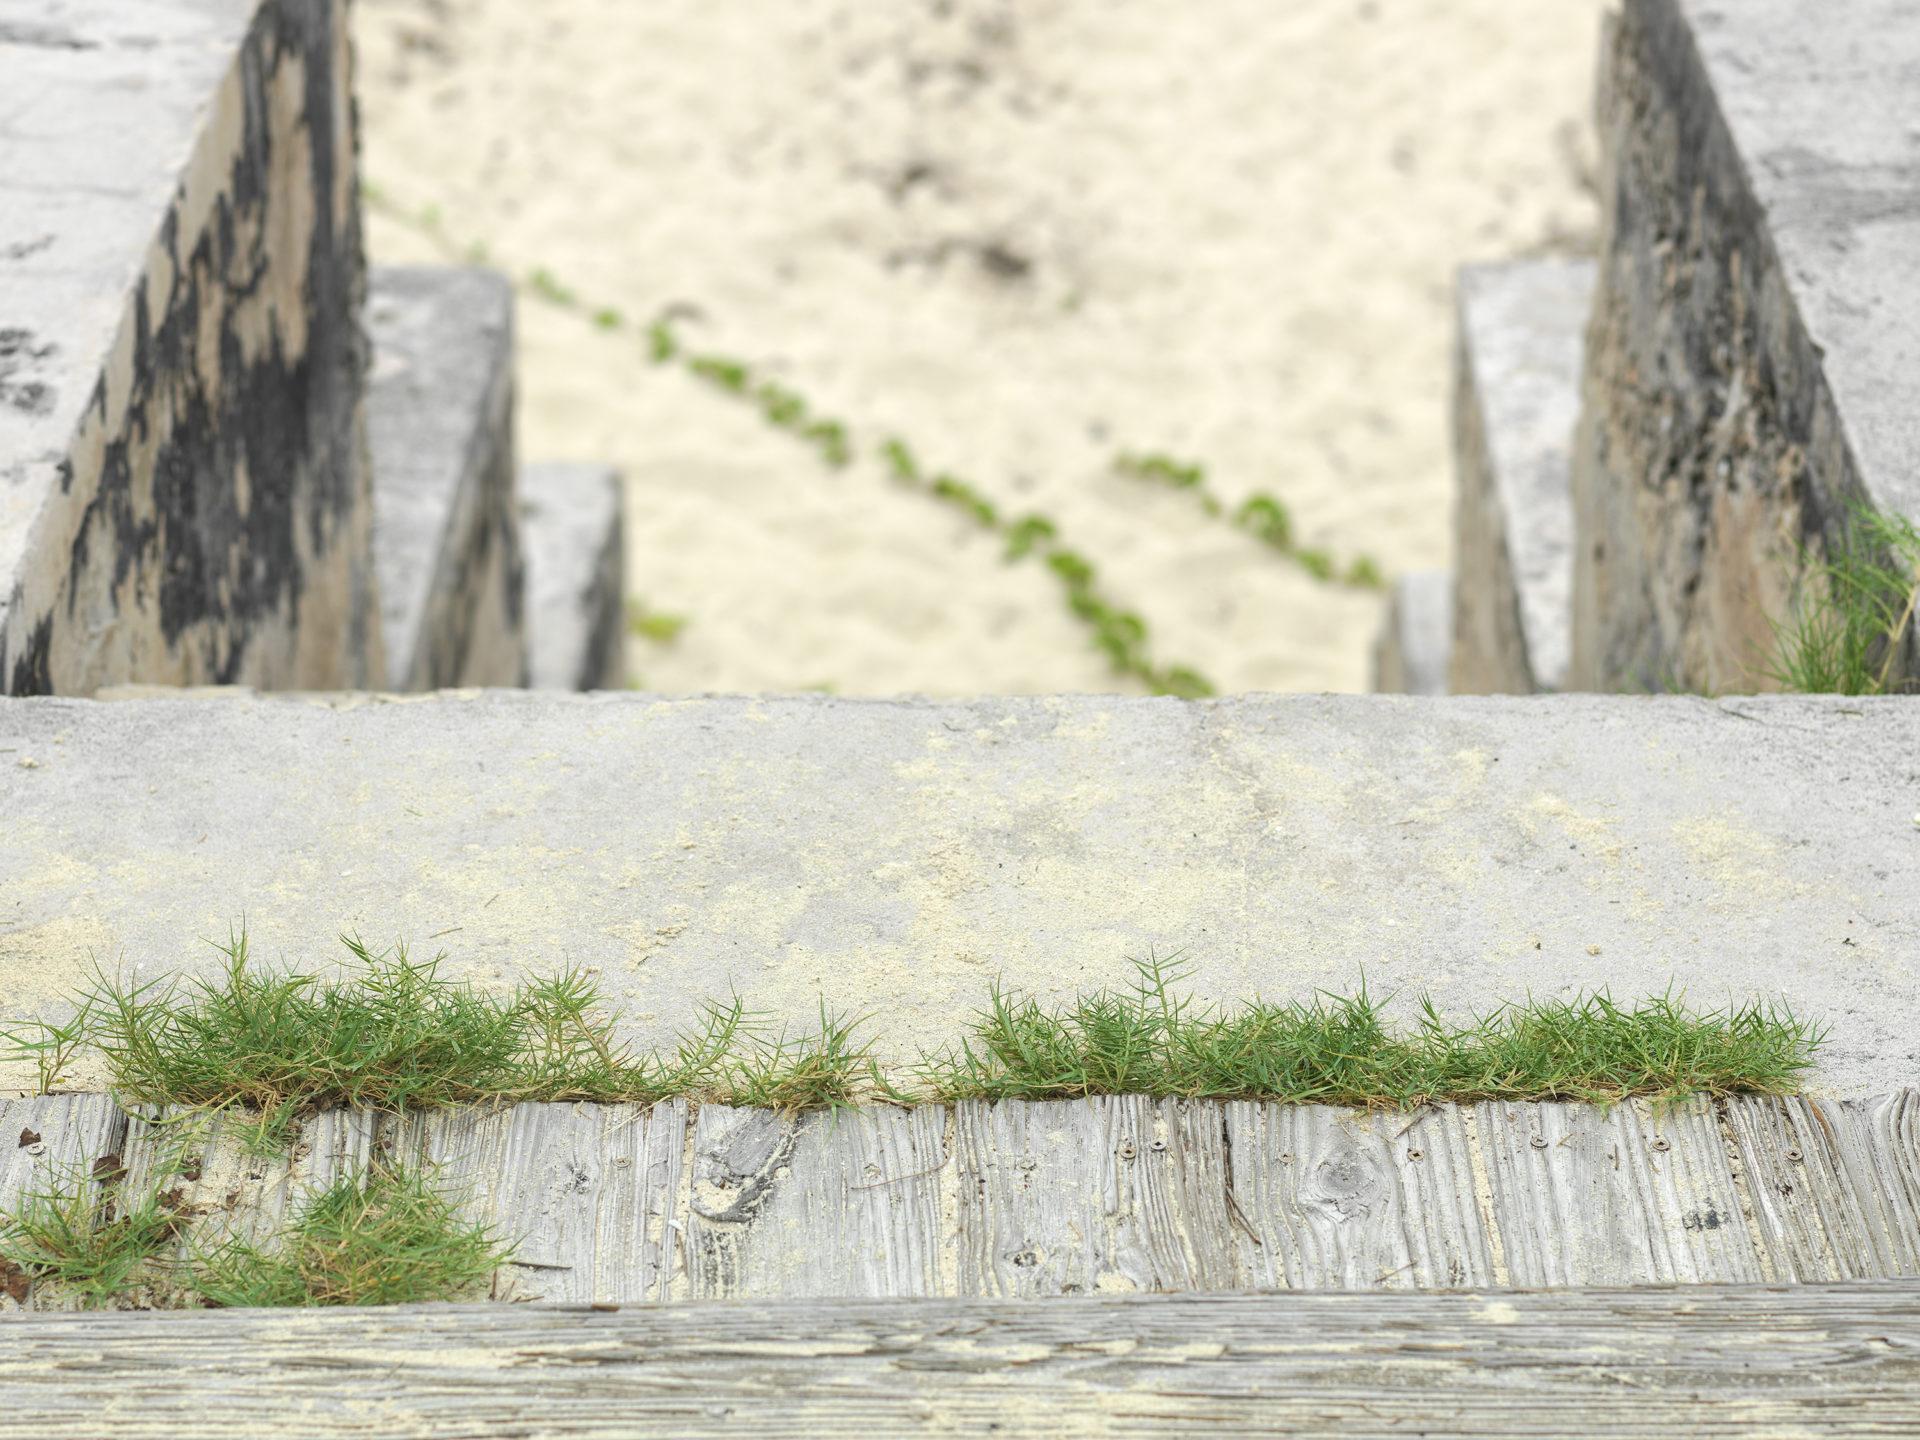 Caribbean stone steps to the beach on Bimini, The Bahamas.